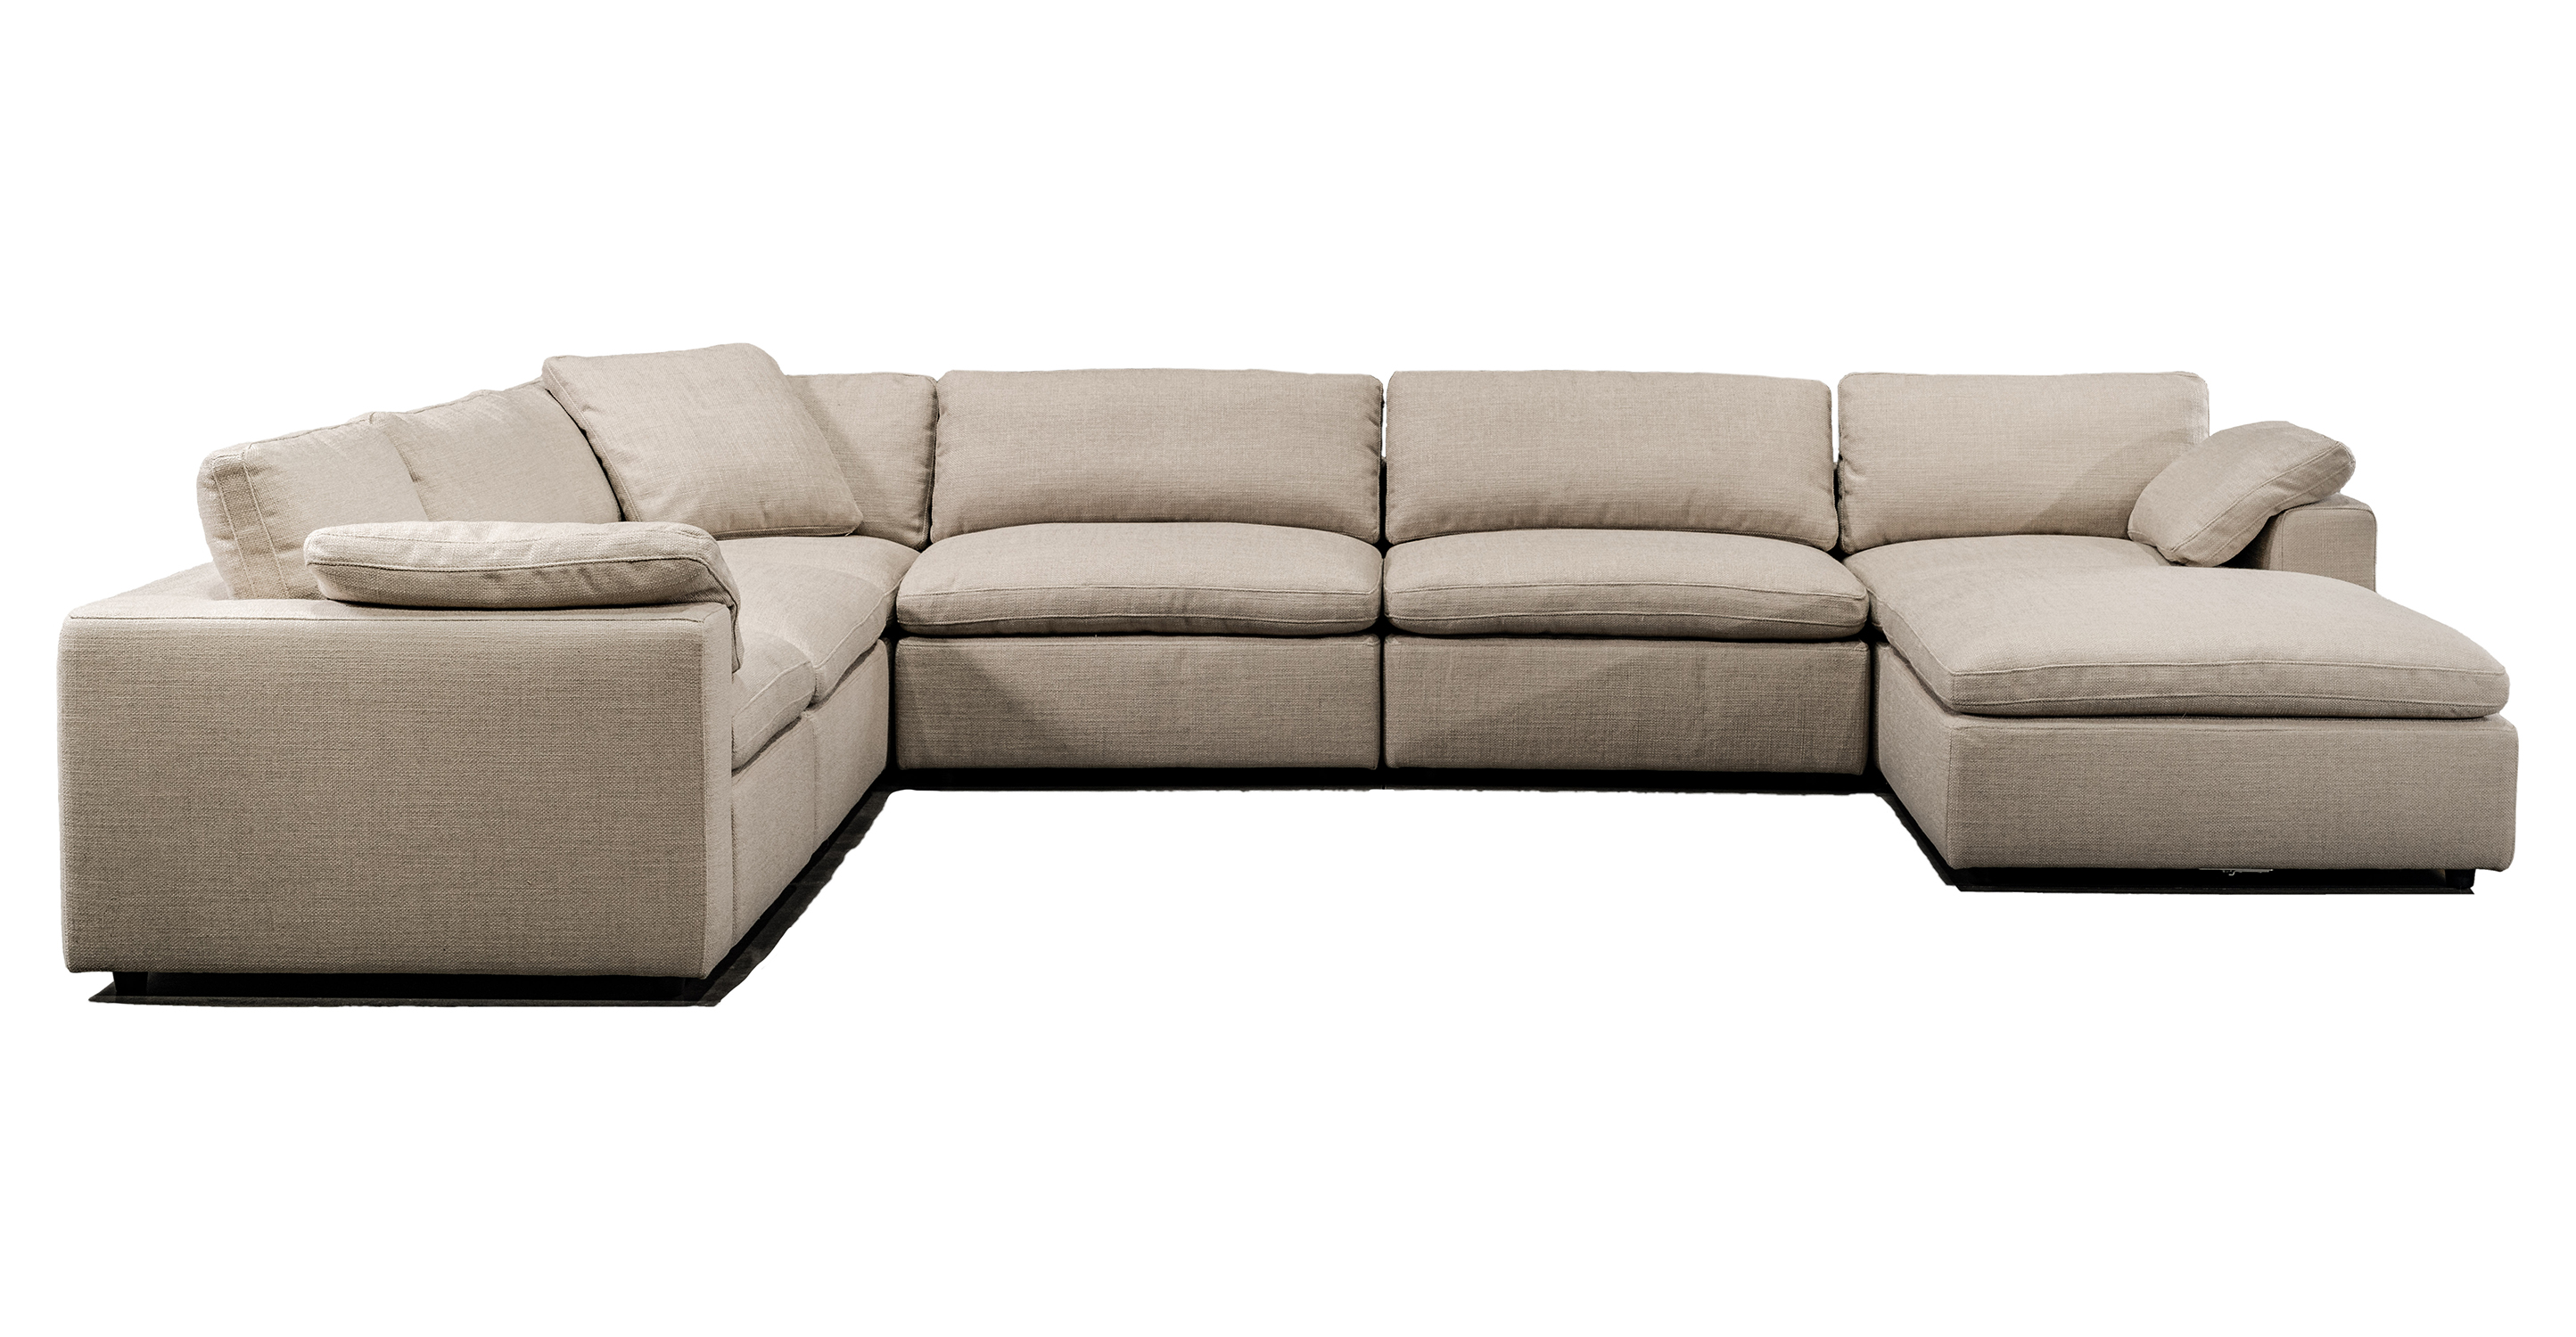 "Nest Modular 159"" Brant 7-pc Fabric Sofa Sectional, Dunes"